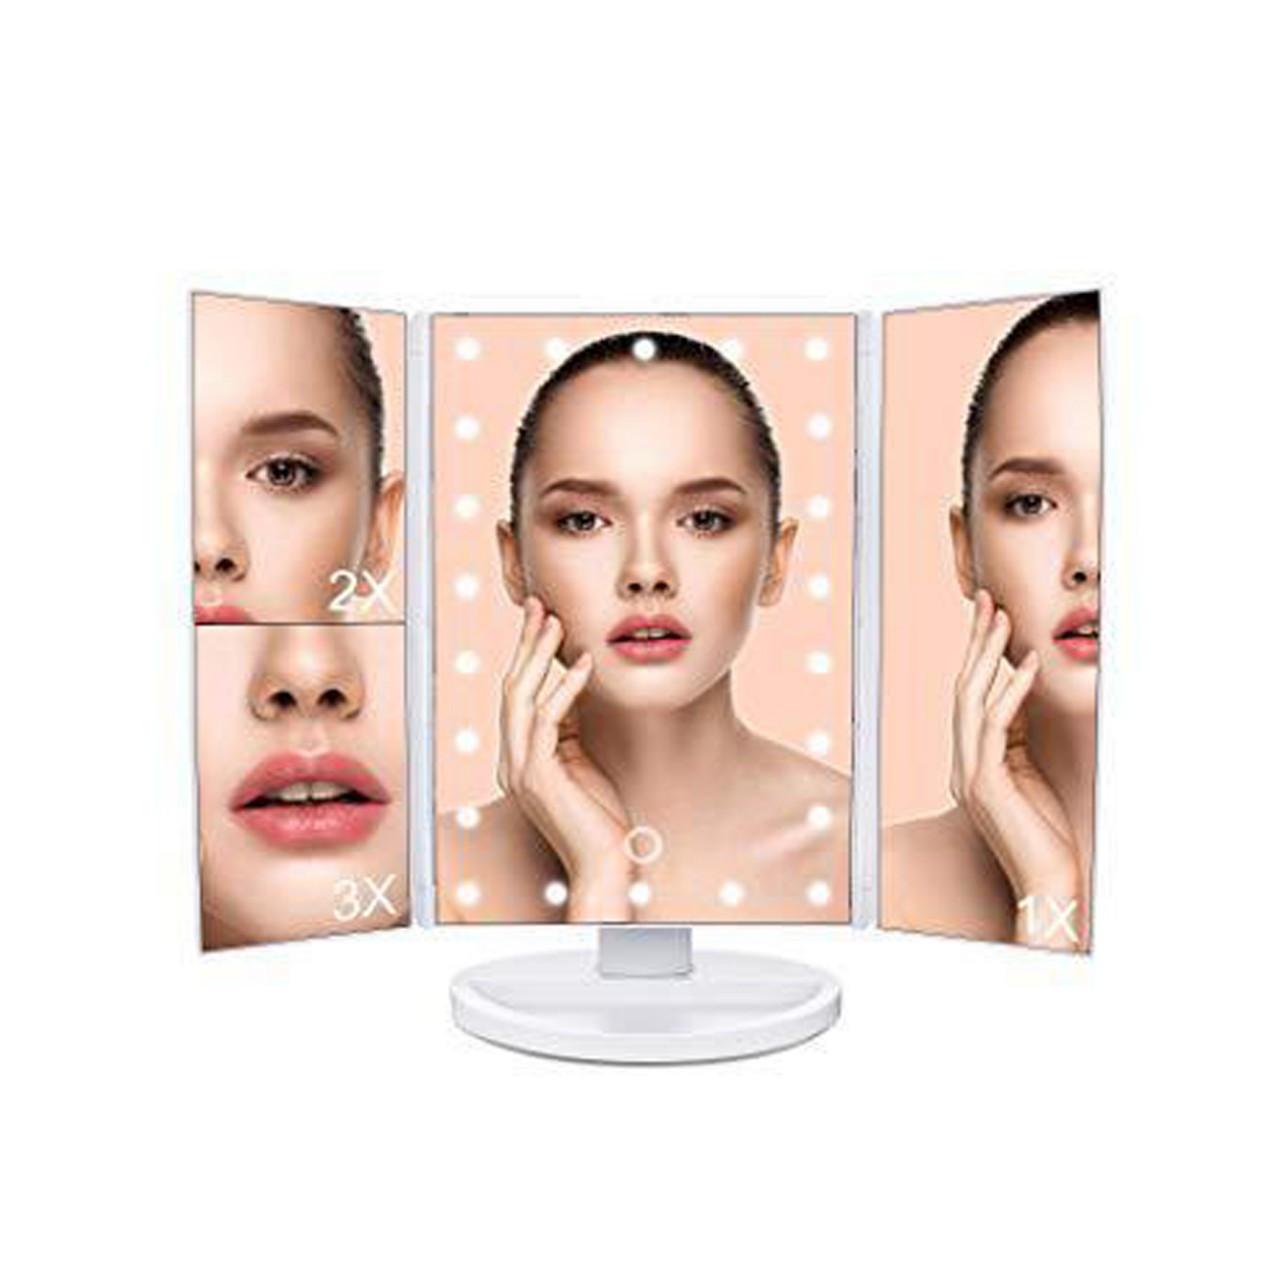 LED Зеркало с подсветкой для макияжа Superstar Magnifying Mirror Опт